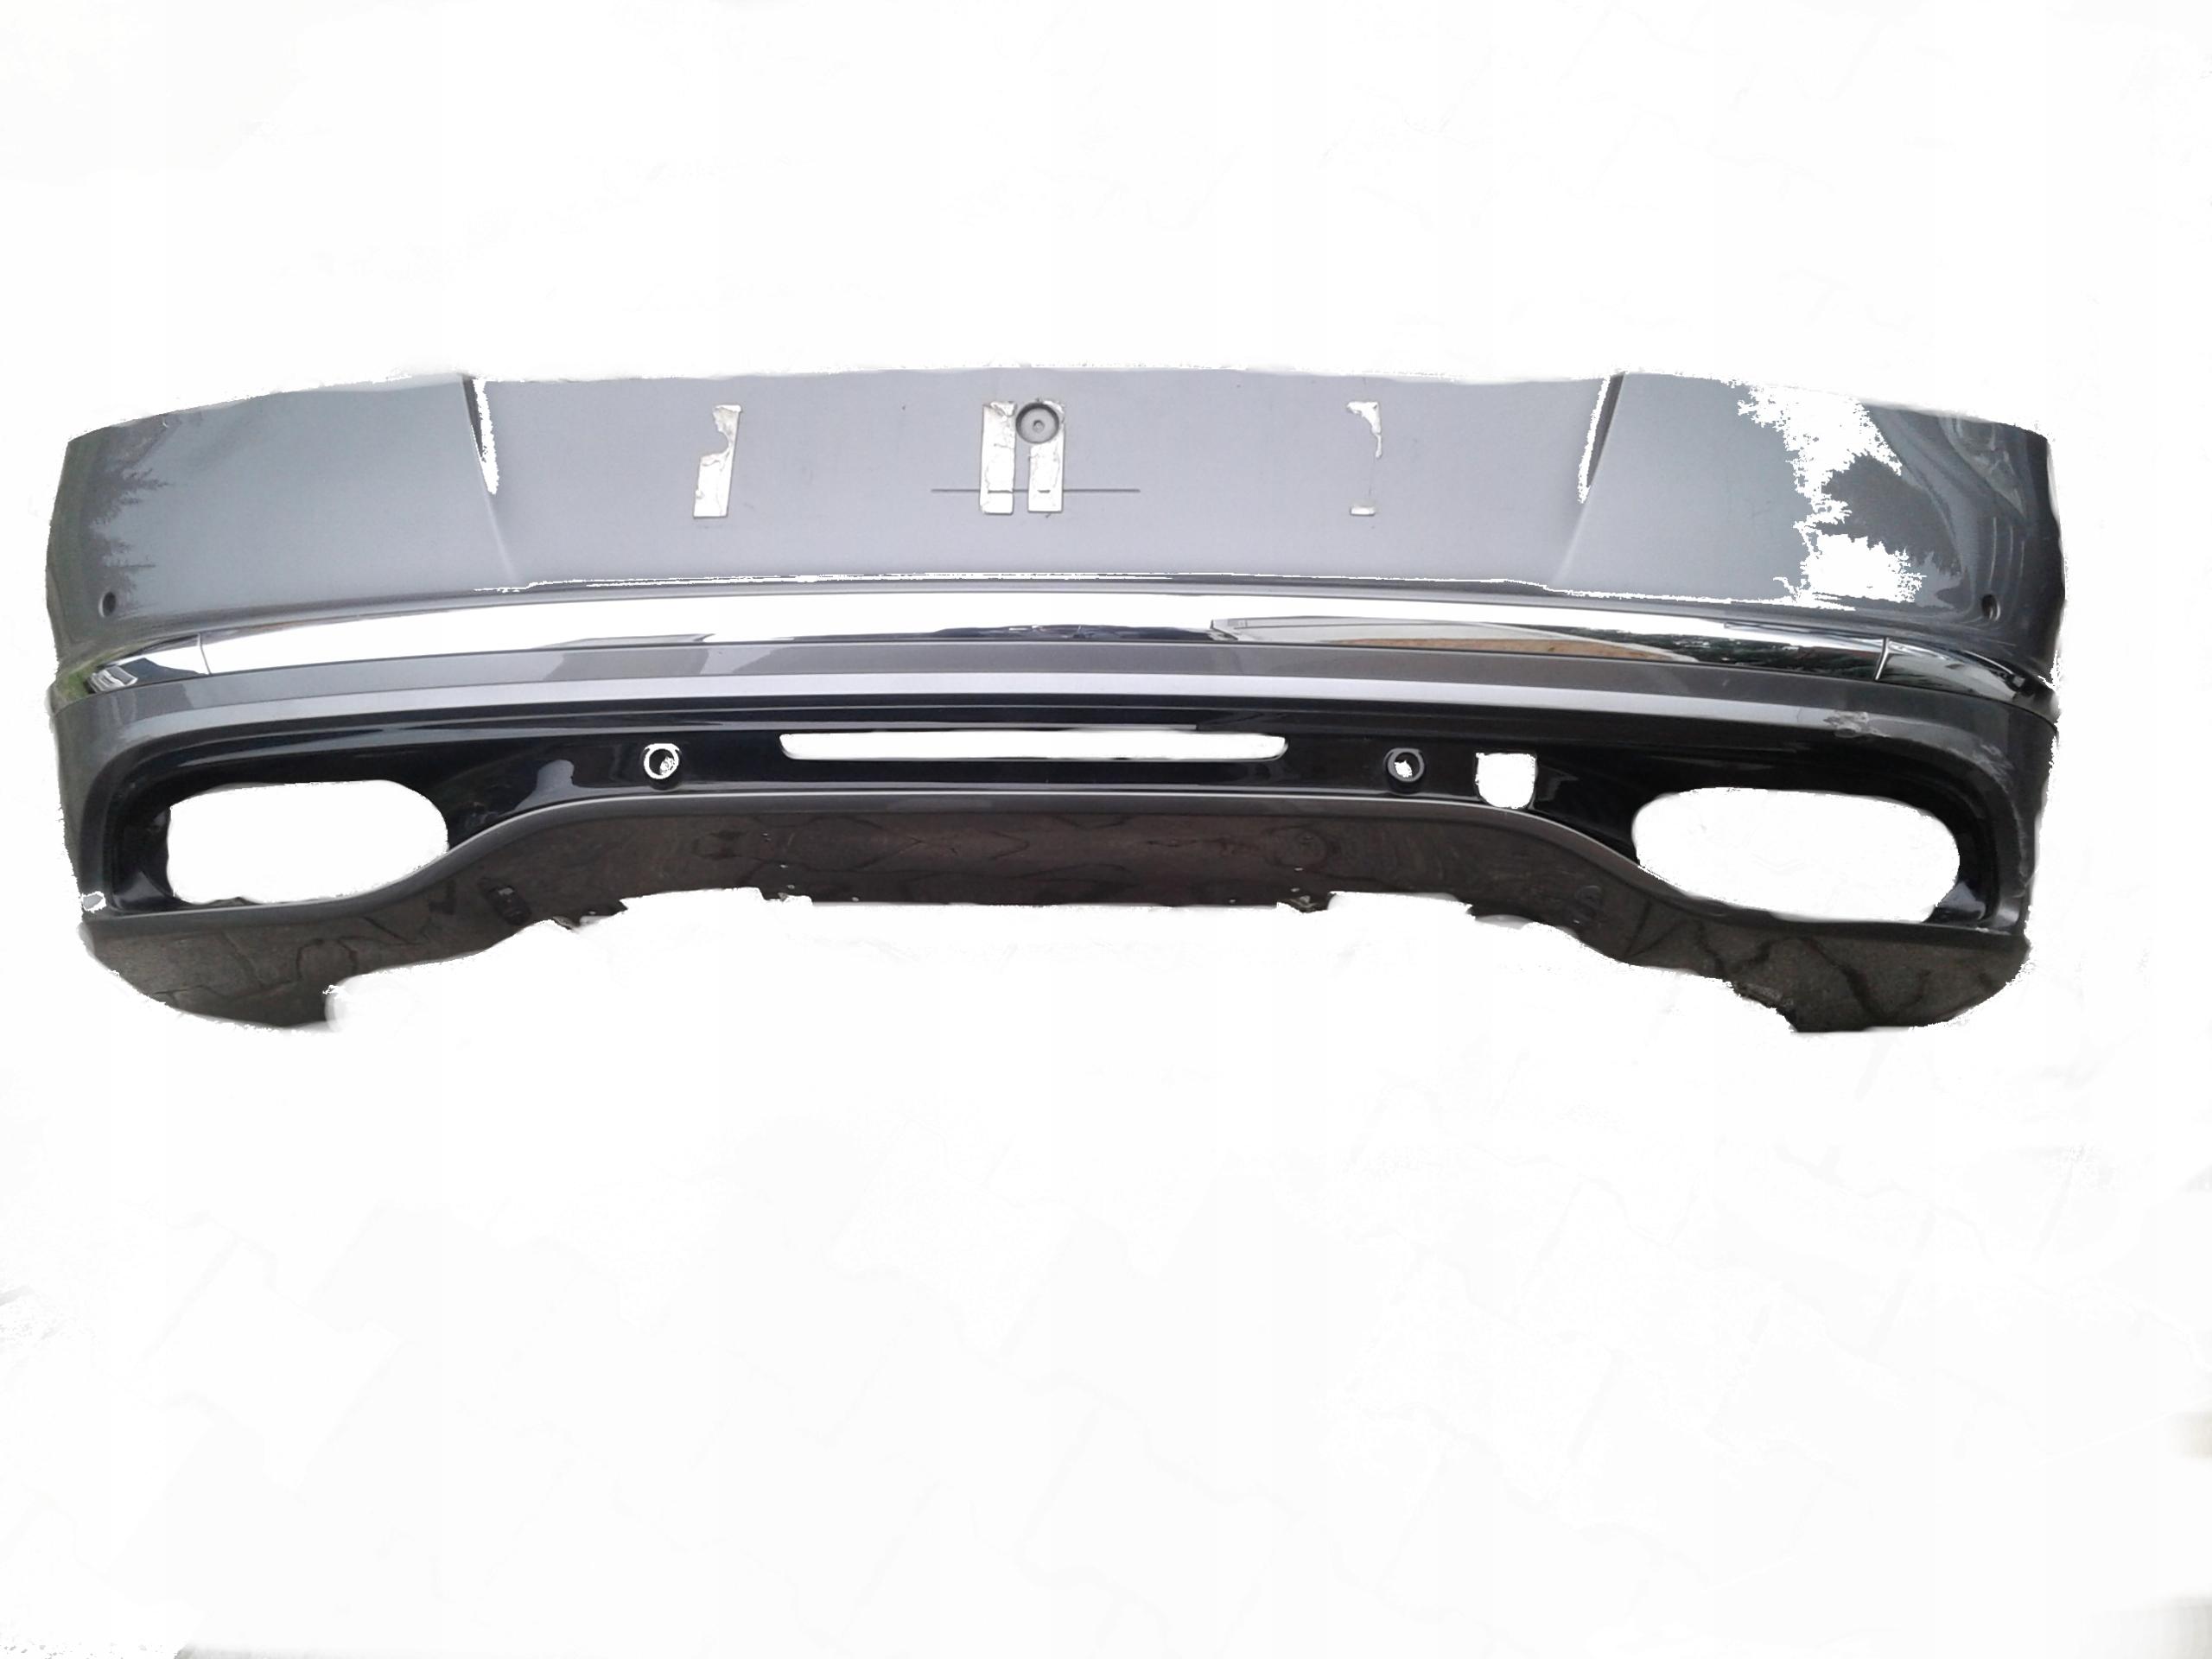 bentley continental gt 15-18 бампер задняя панель сзади